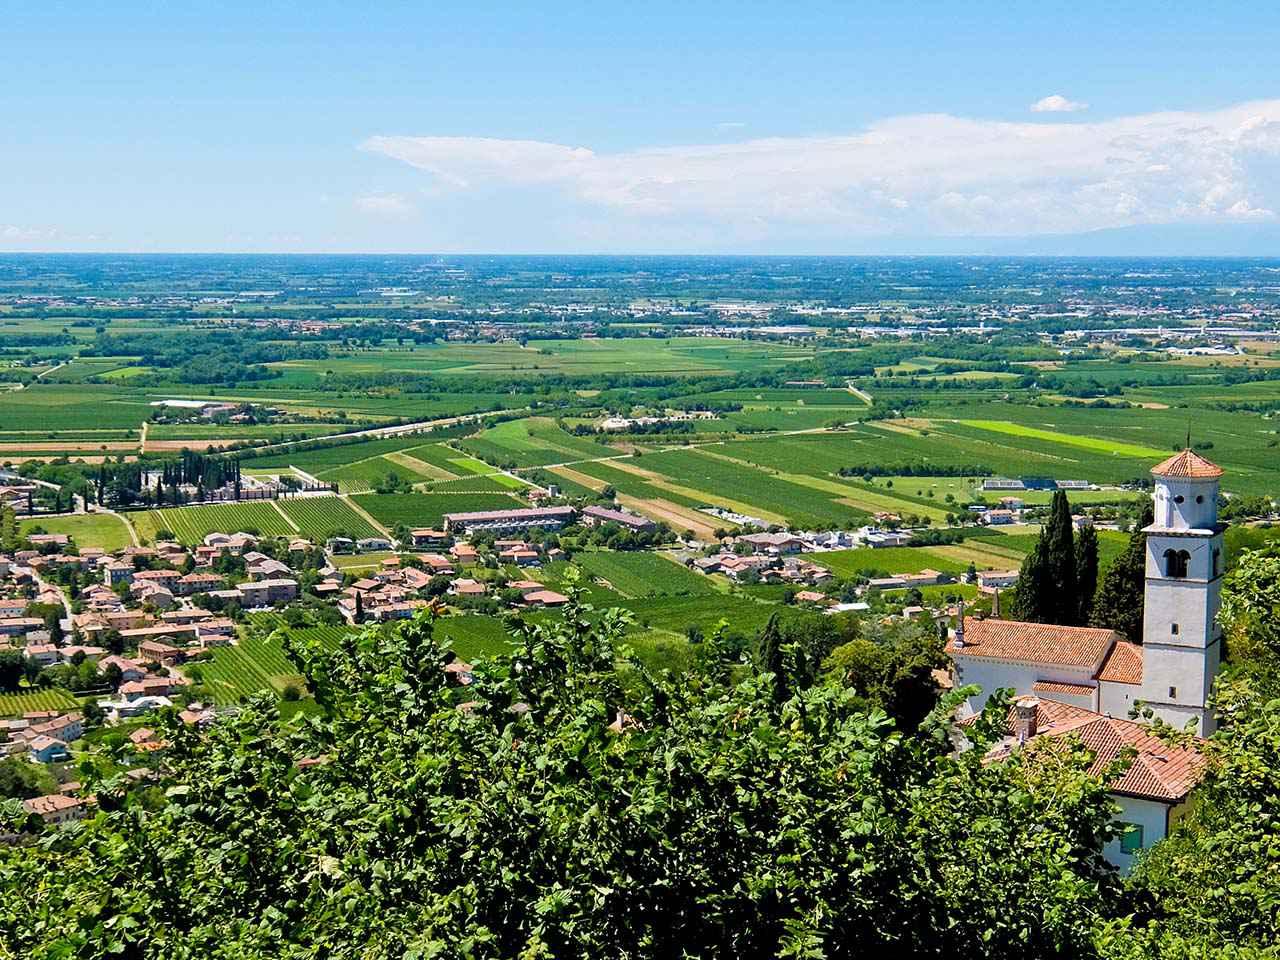 Fruili Plain, Italy